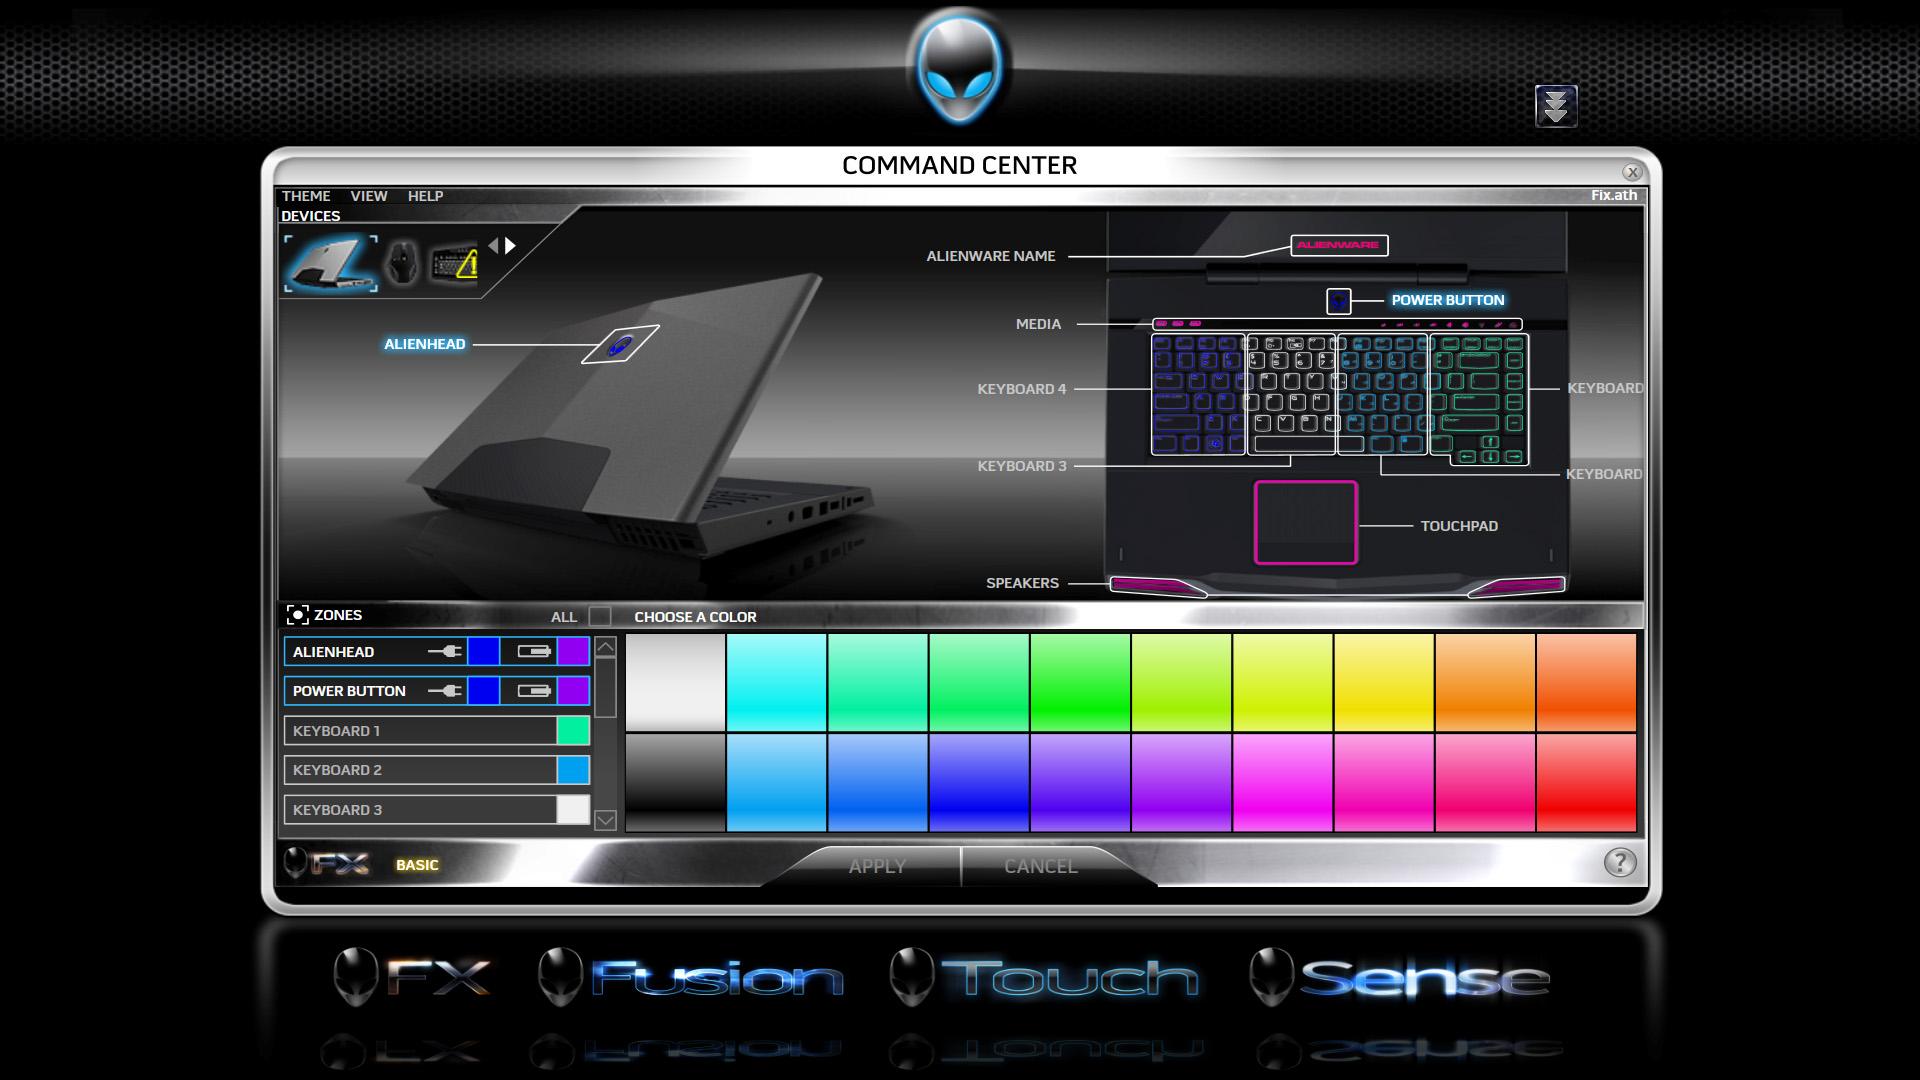 cmc Review : DELL Alienware M15x Core i7 720 & Geforce GTX260m